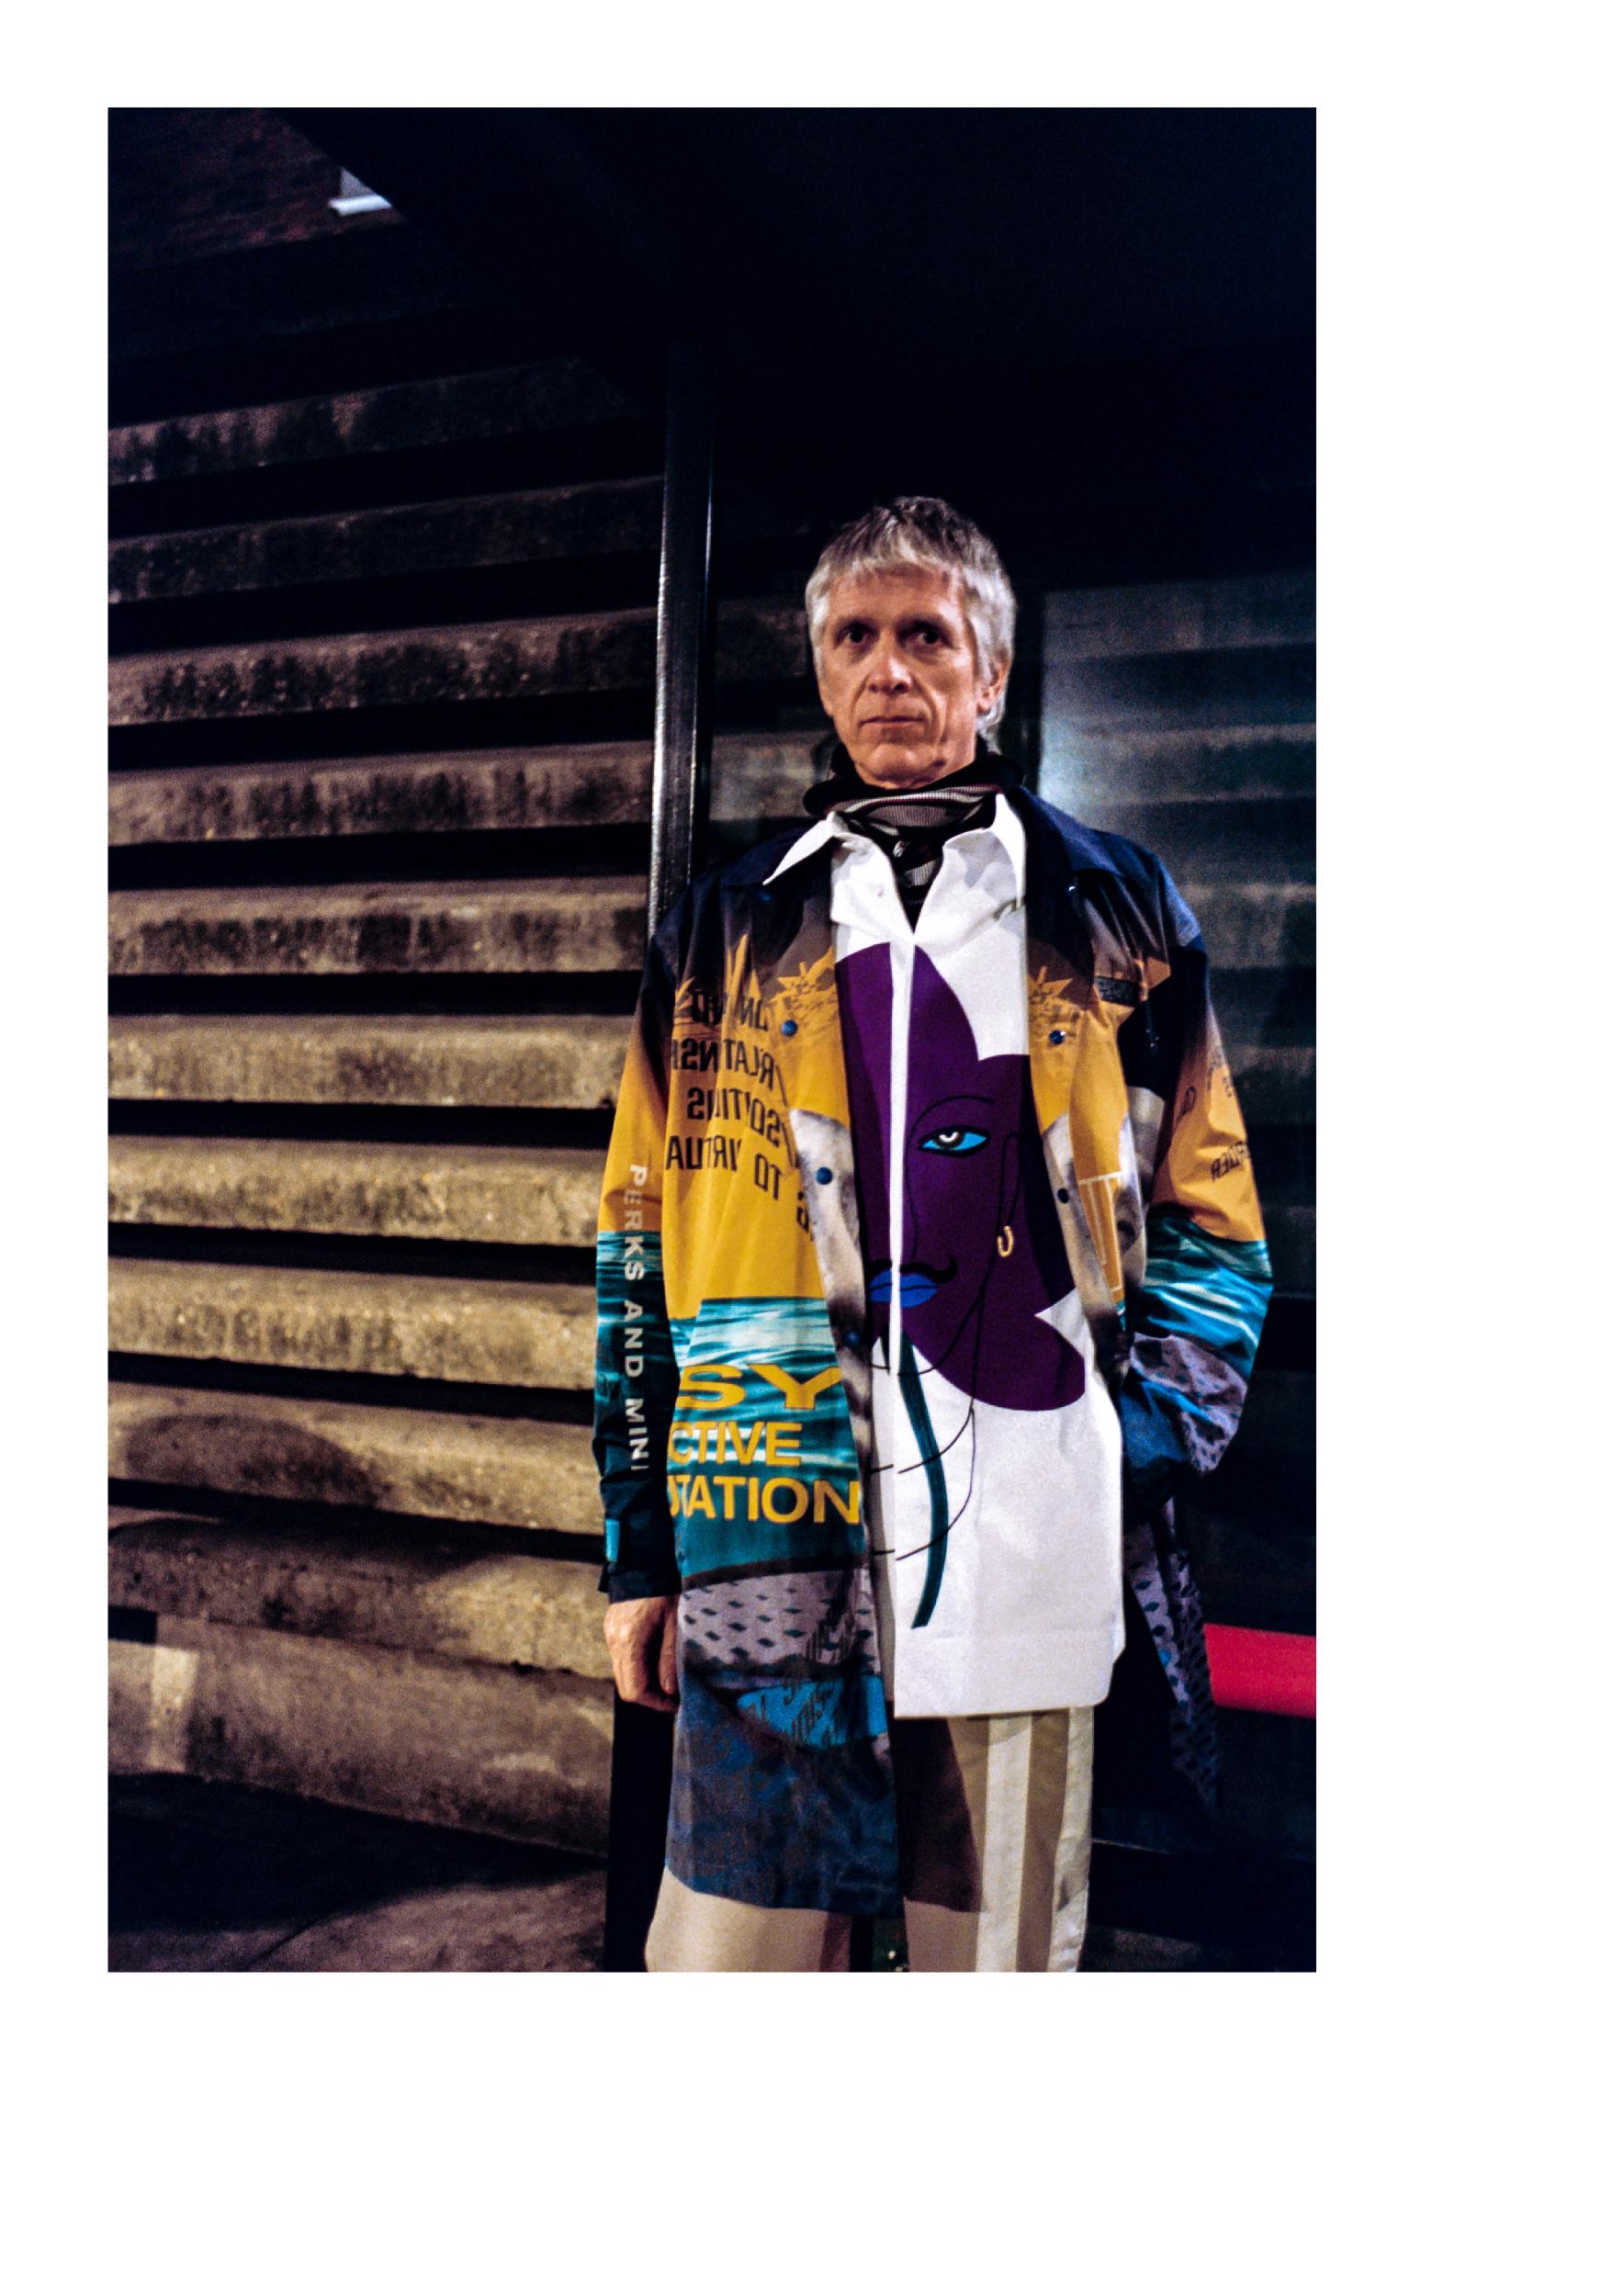 Shoes - G.H Bass Coat - PAM Balaclava - Napapjiri x Martine Rose Shirt - Pronounce Trousers - 3.Paradis